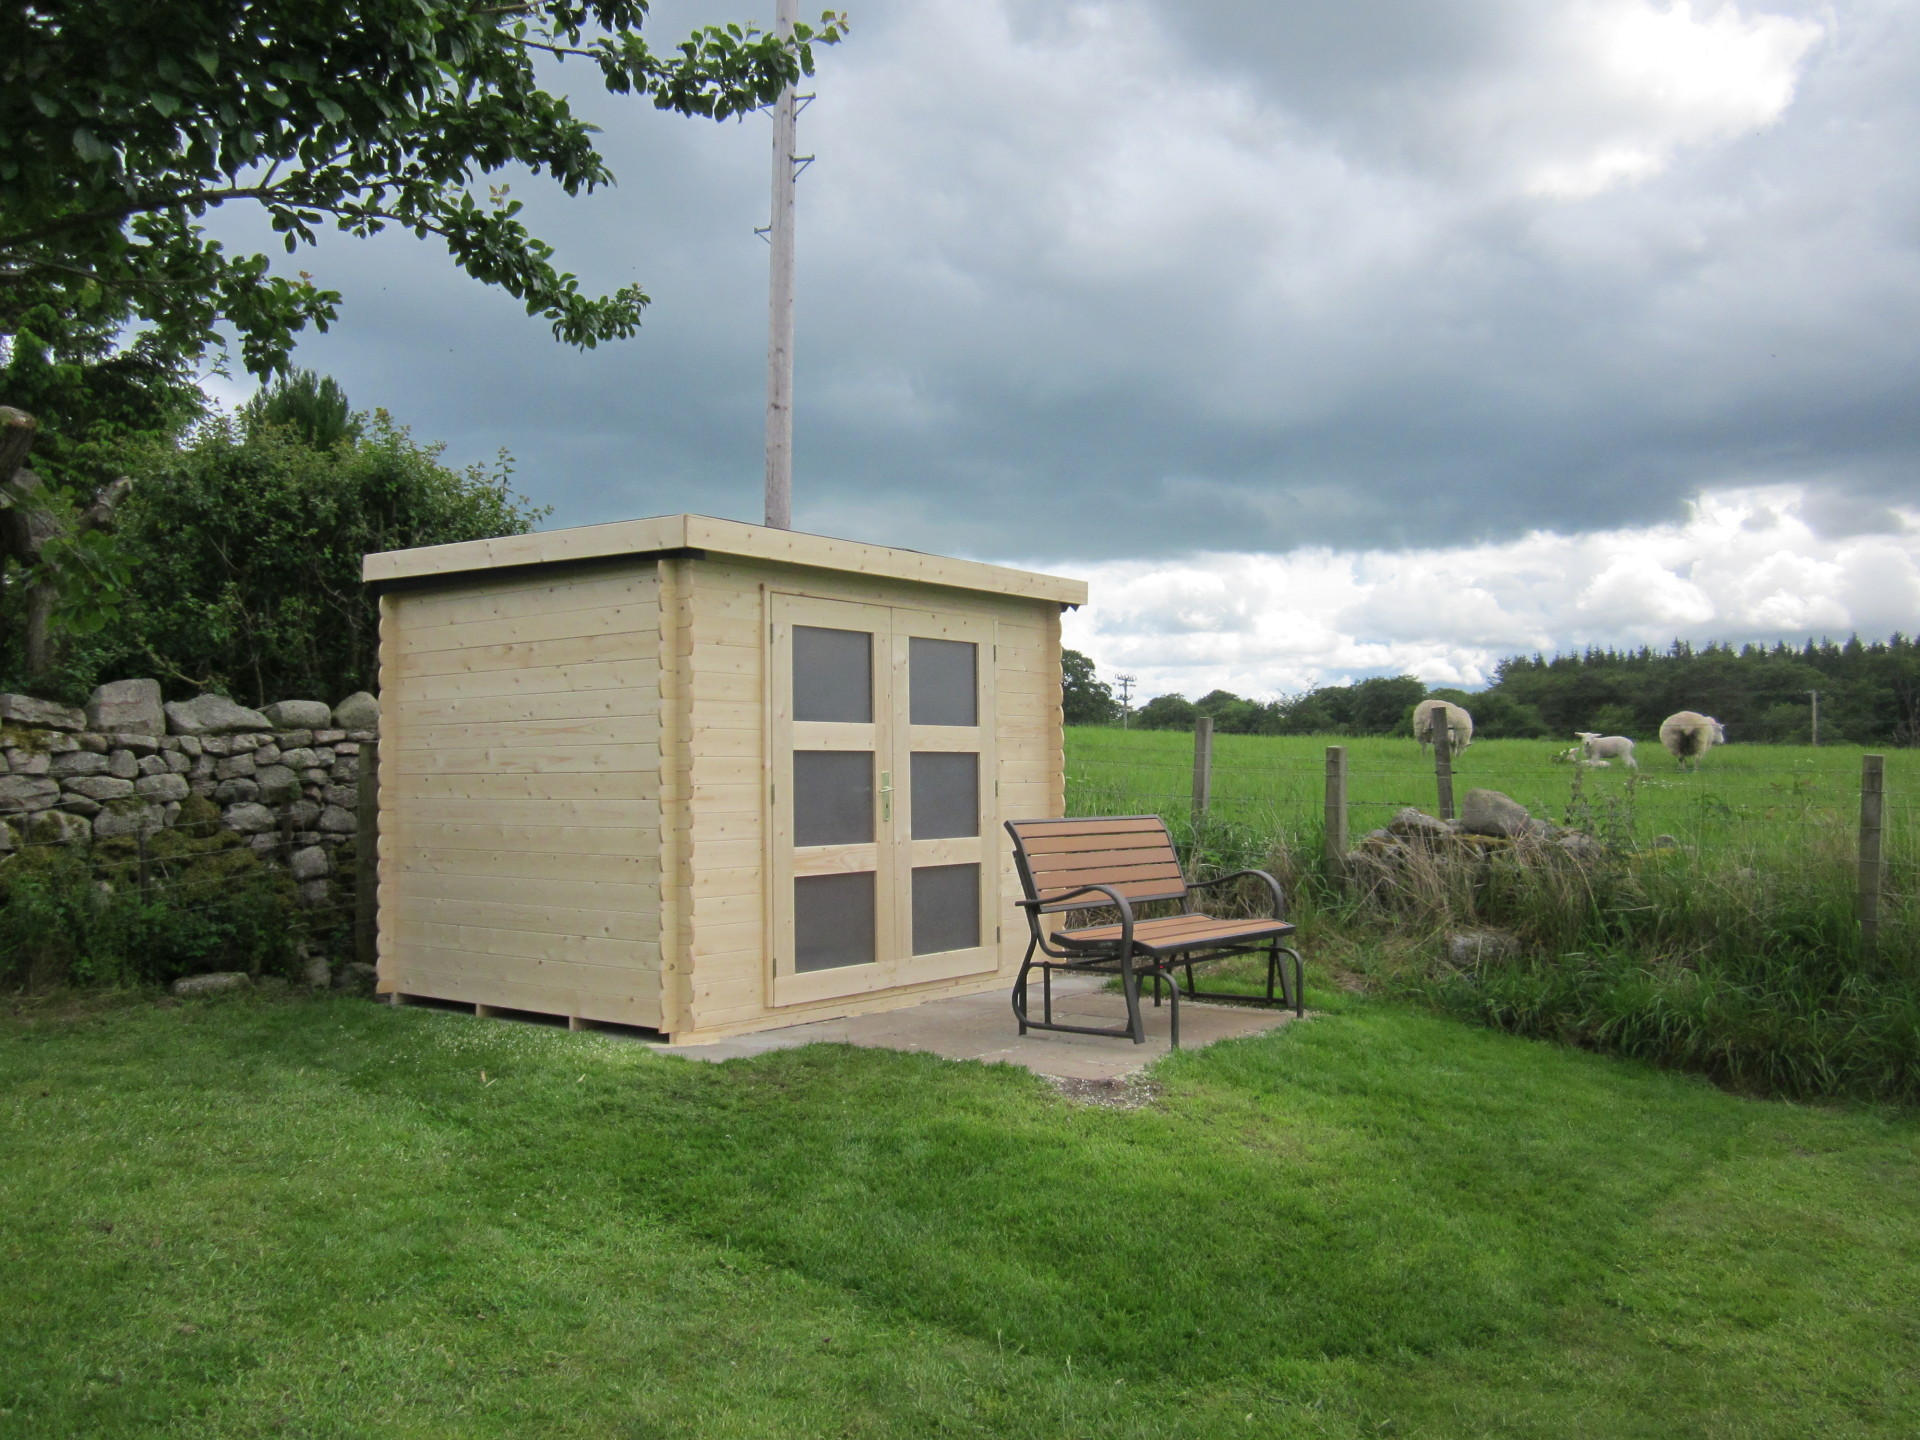 sheds, garden shed, shed construction